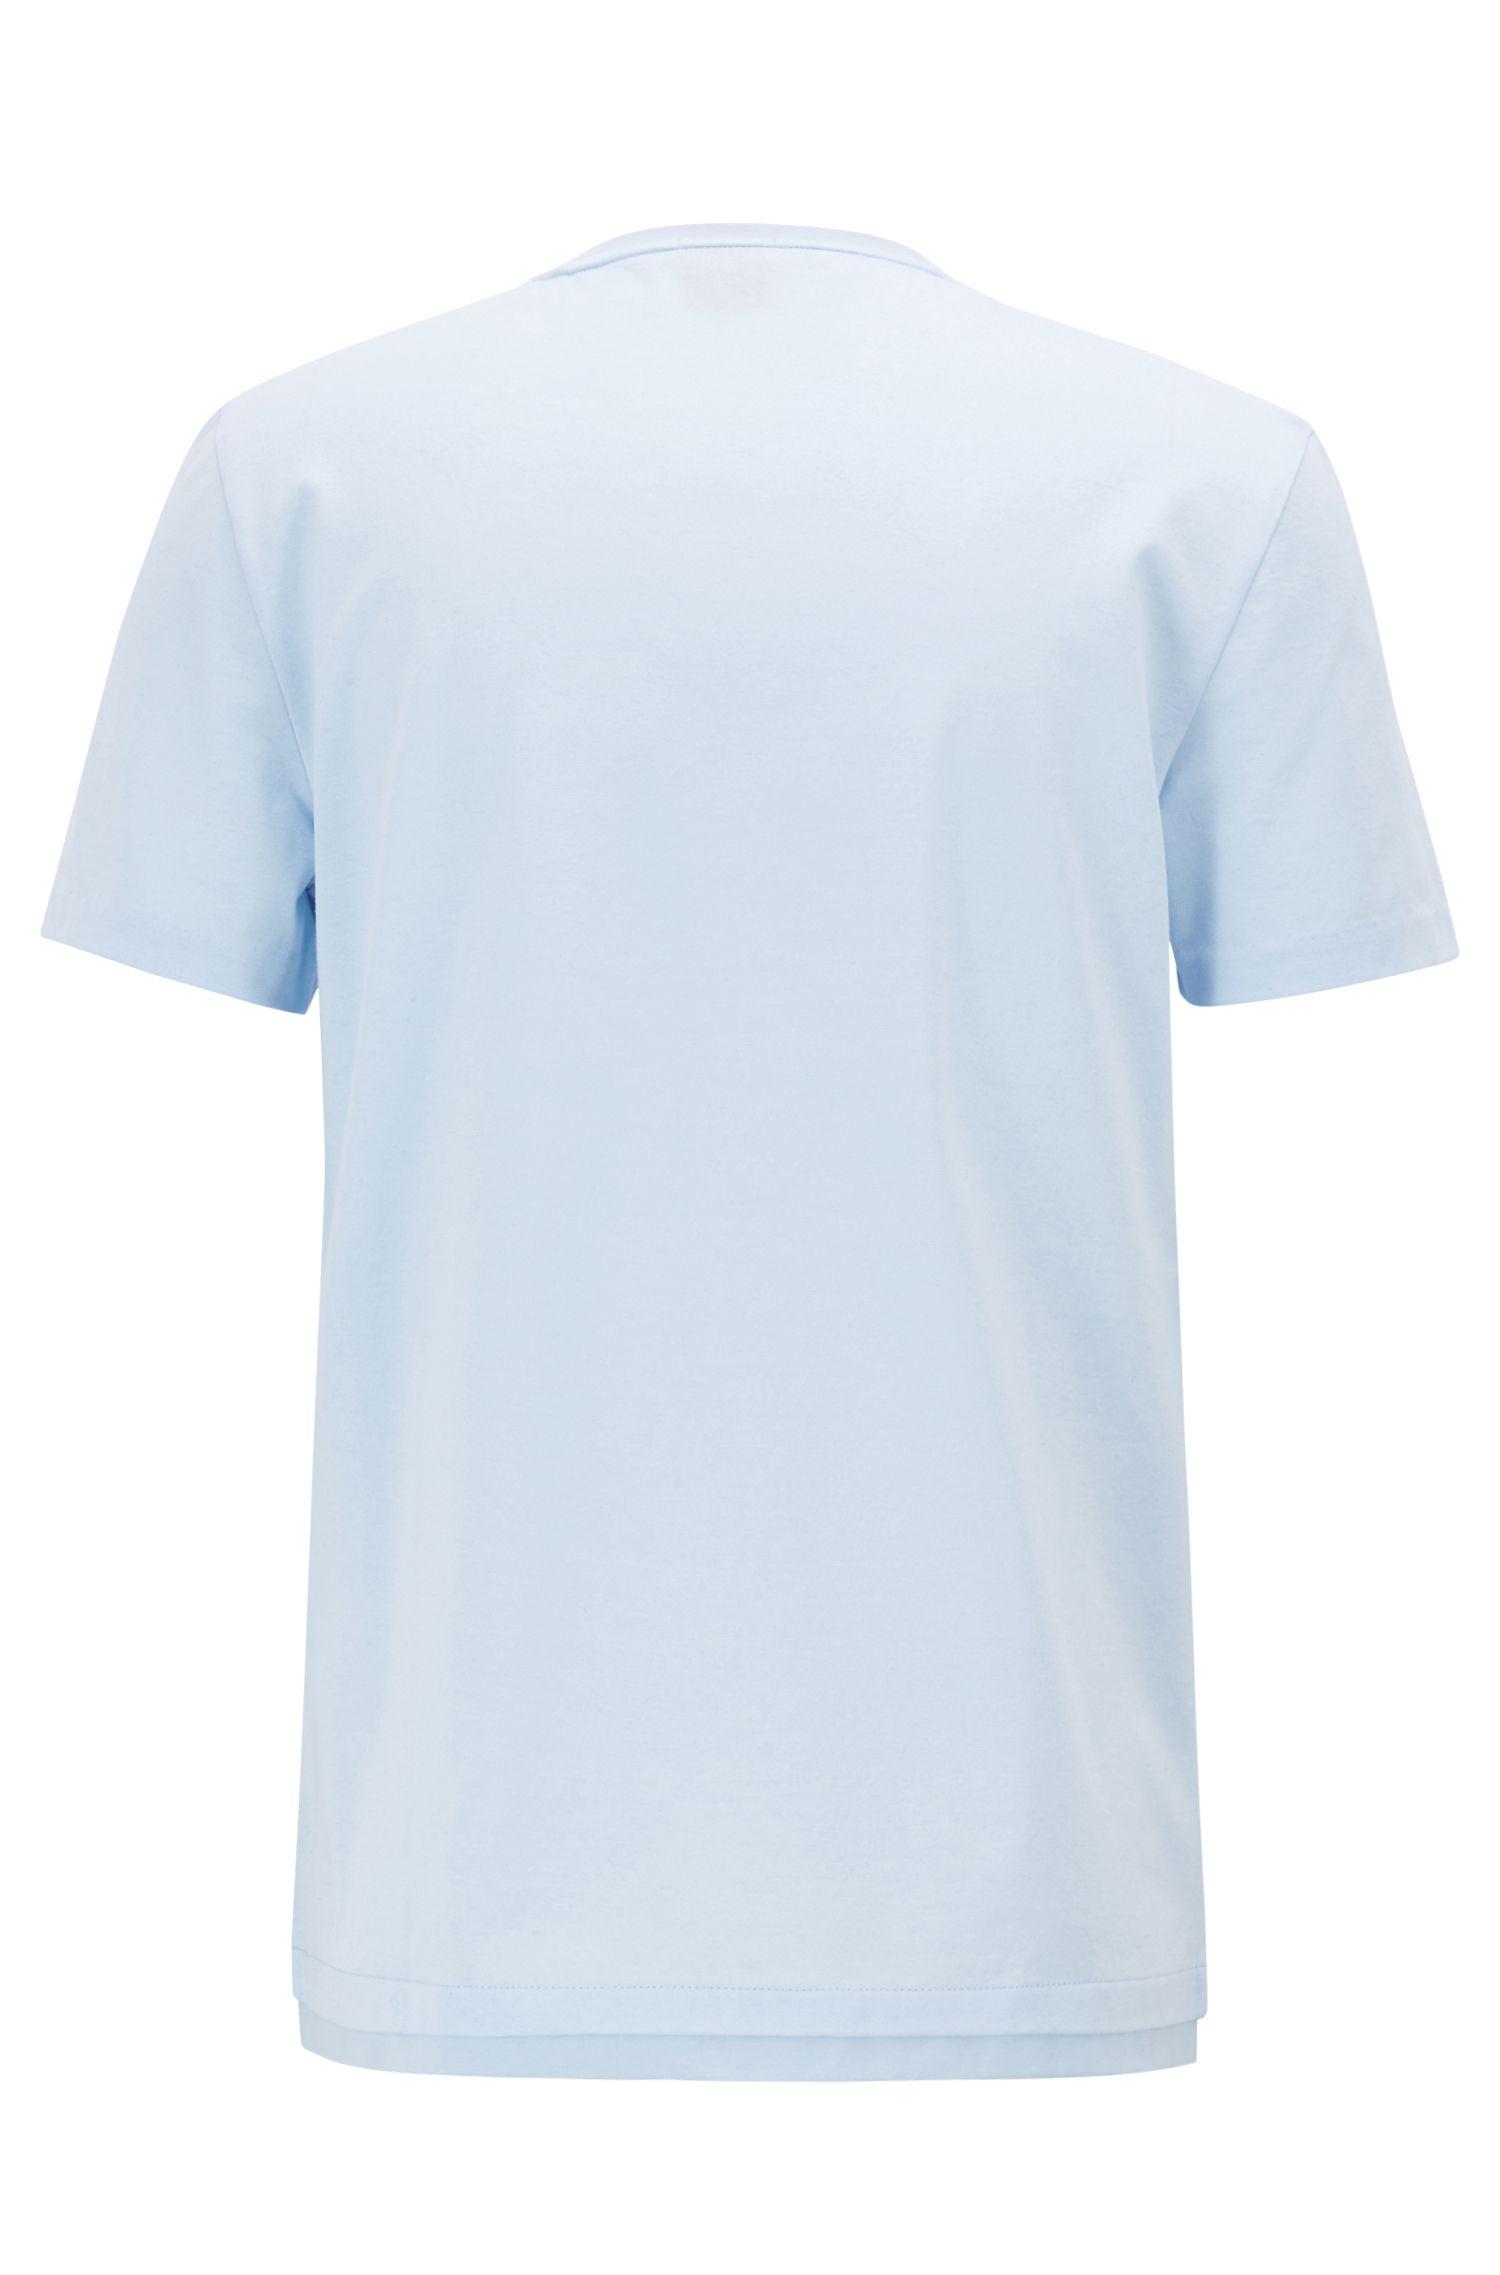 Slim-Fit T-Shirt aus merzerisierter Mouliné-Baumwolle, Hellblau